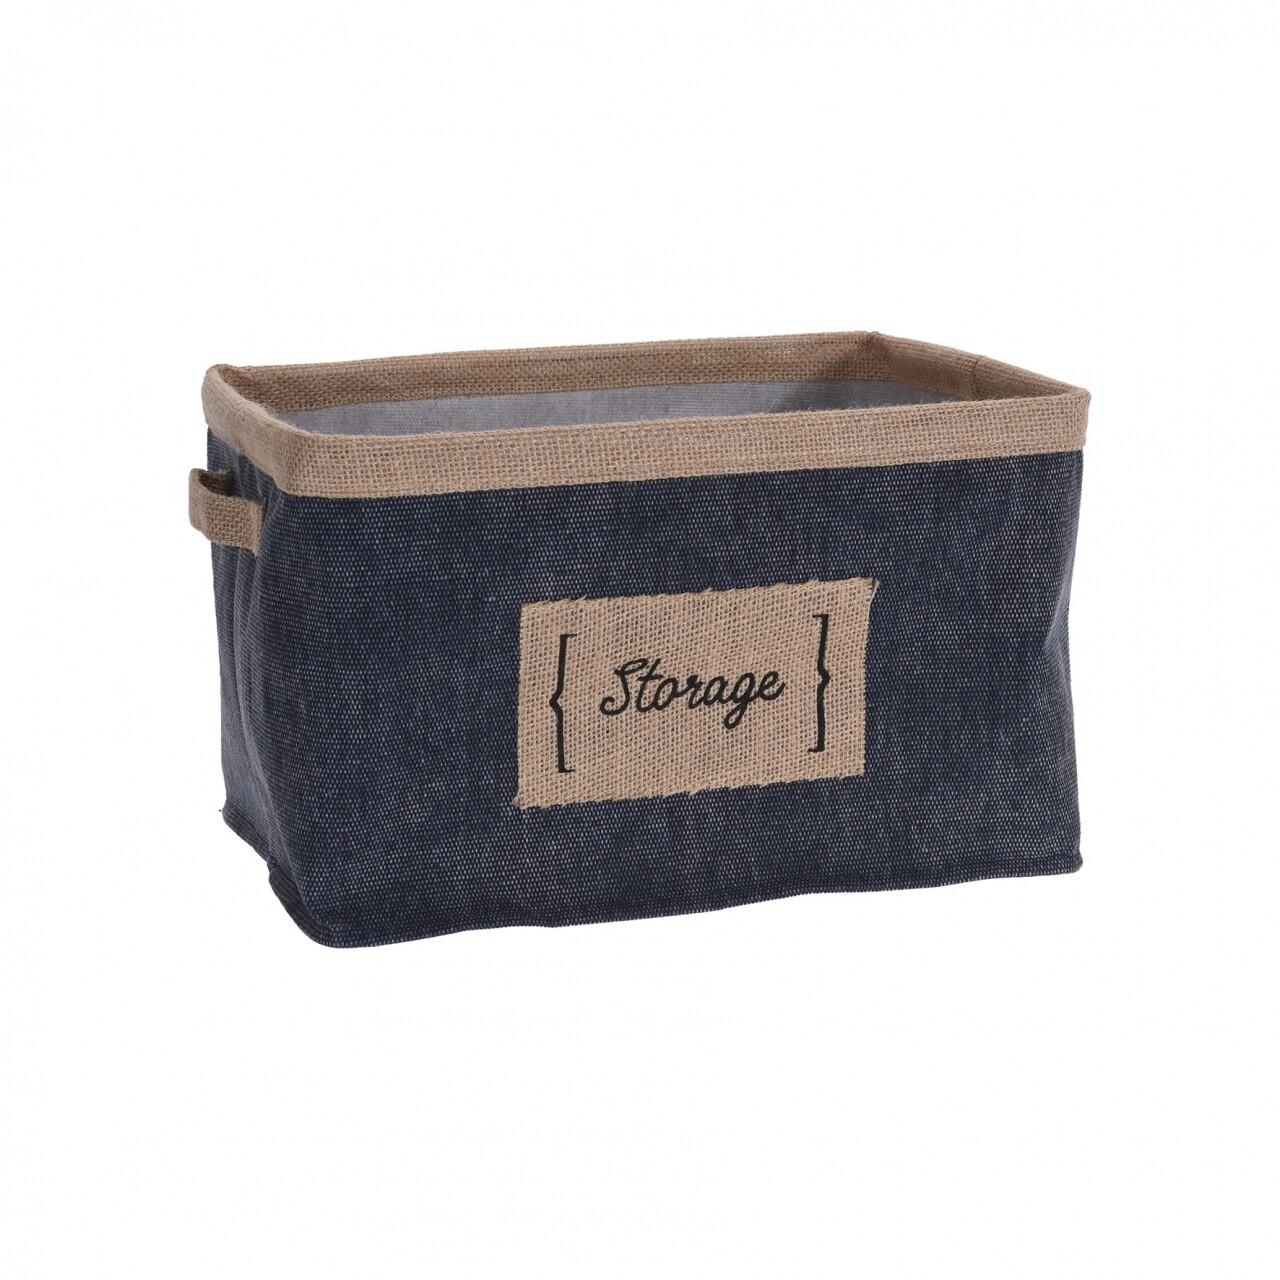 Cos depozitare Storage, 32x25x20 cm, panza/iuta, gri/bej